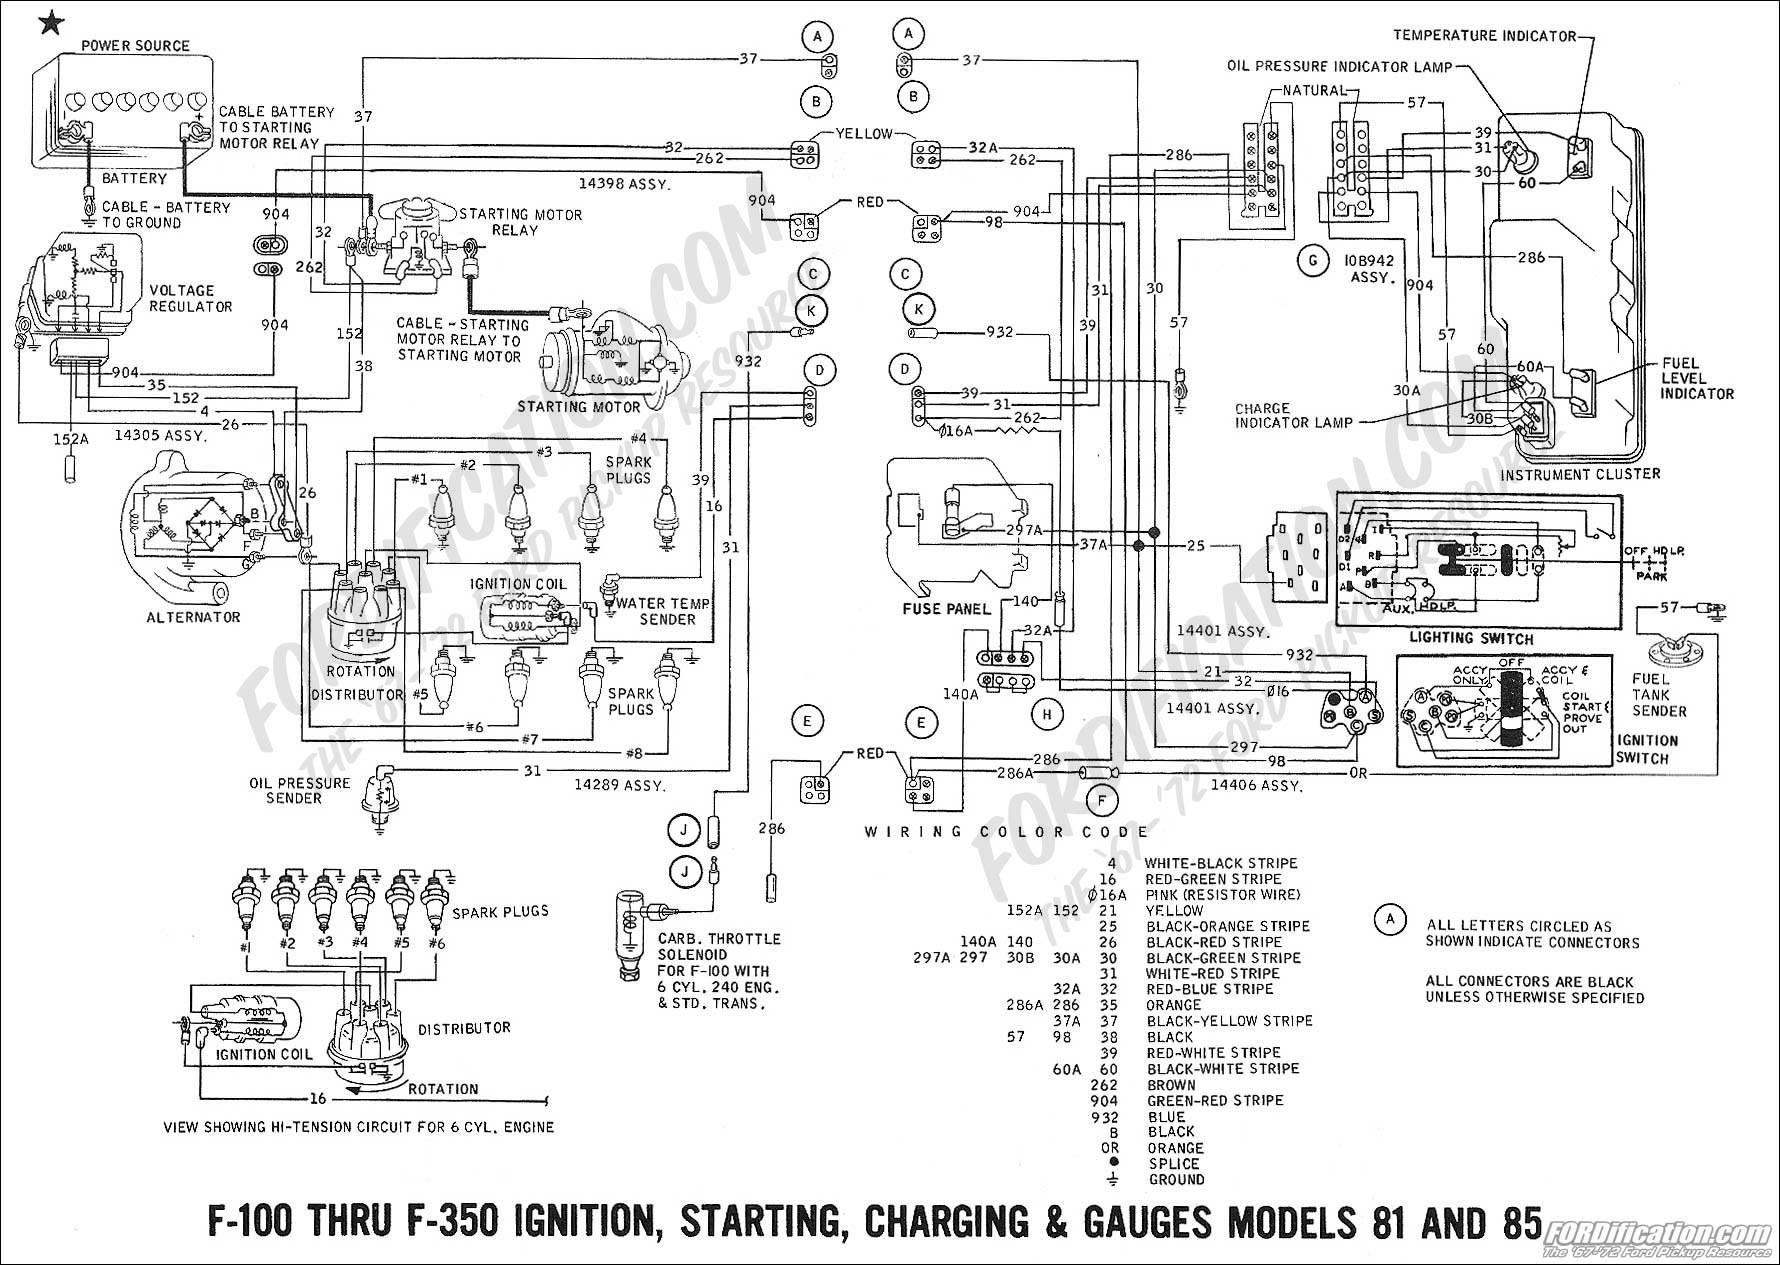 1979 ford bronco engine diagram 78 ford f150 wiring diagram e1 wiring diagram  78 ford f150 wiring diagram e1 wiring